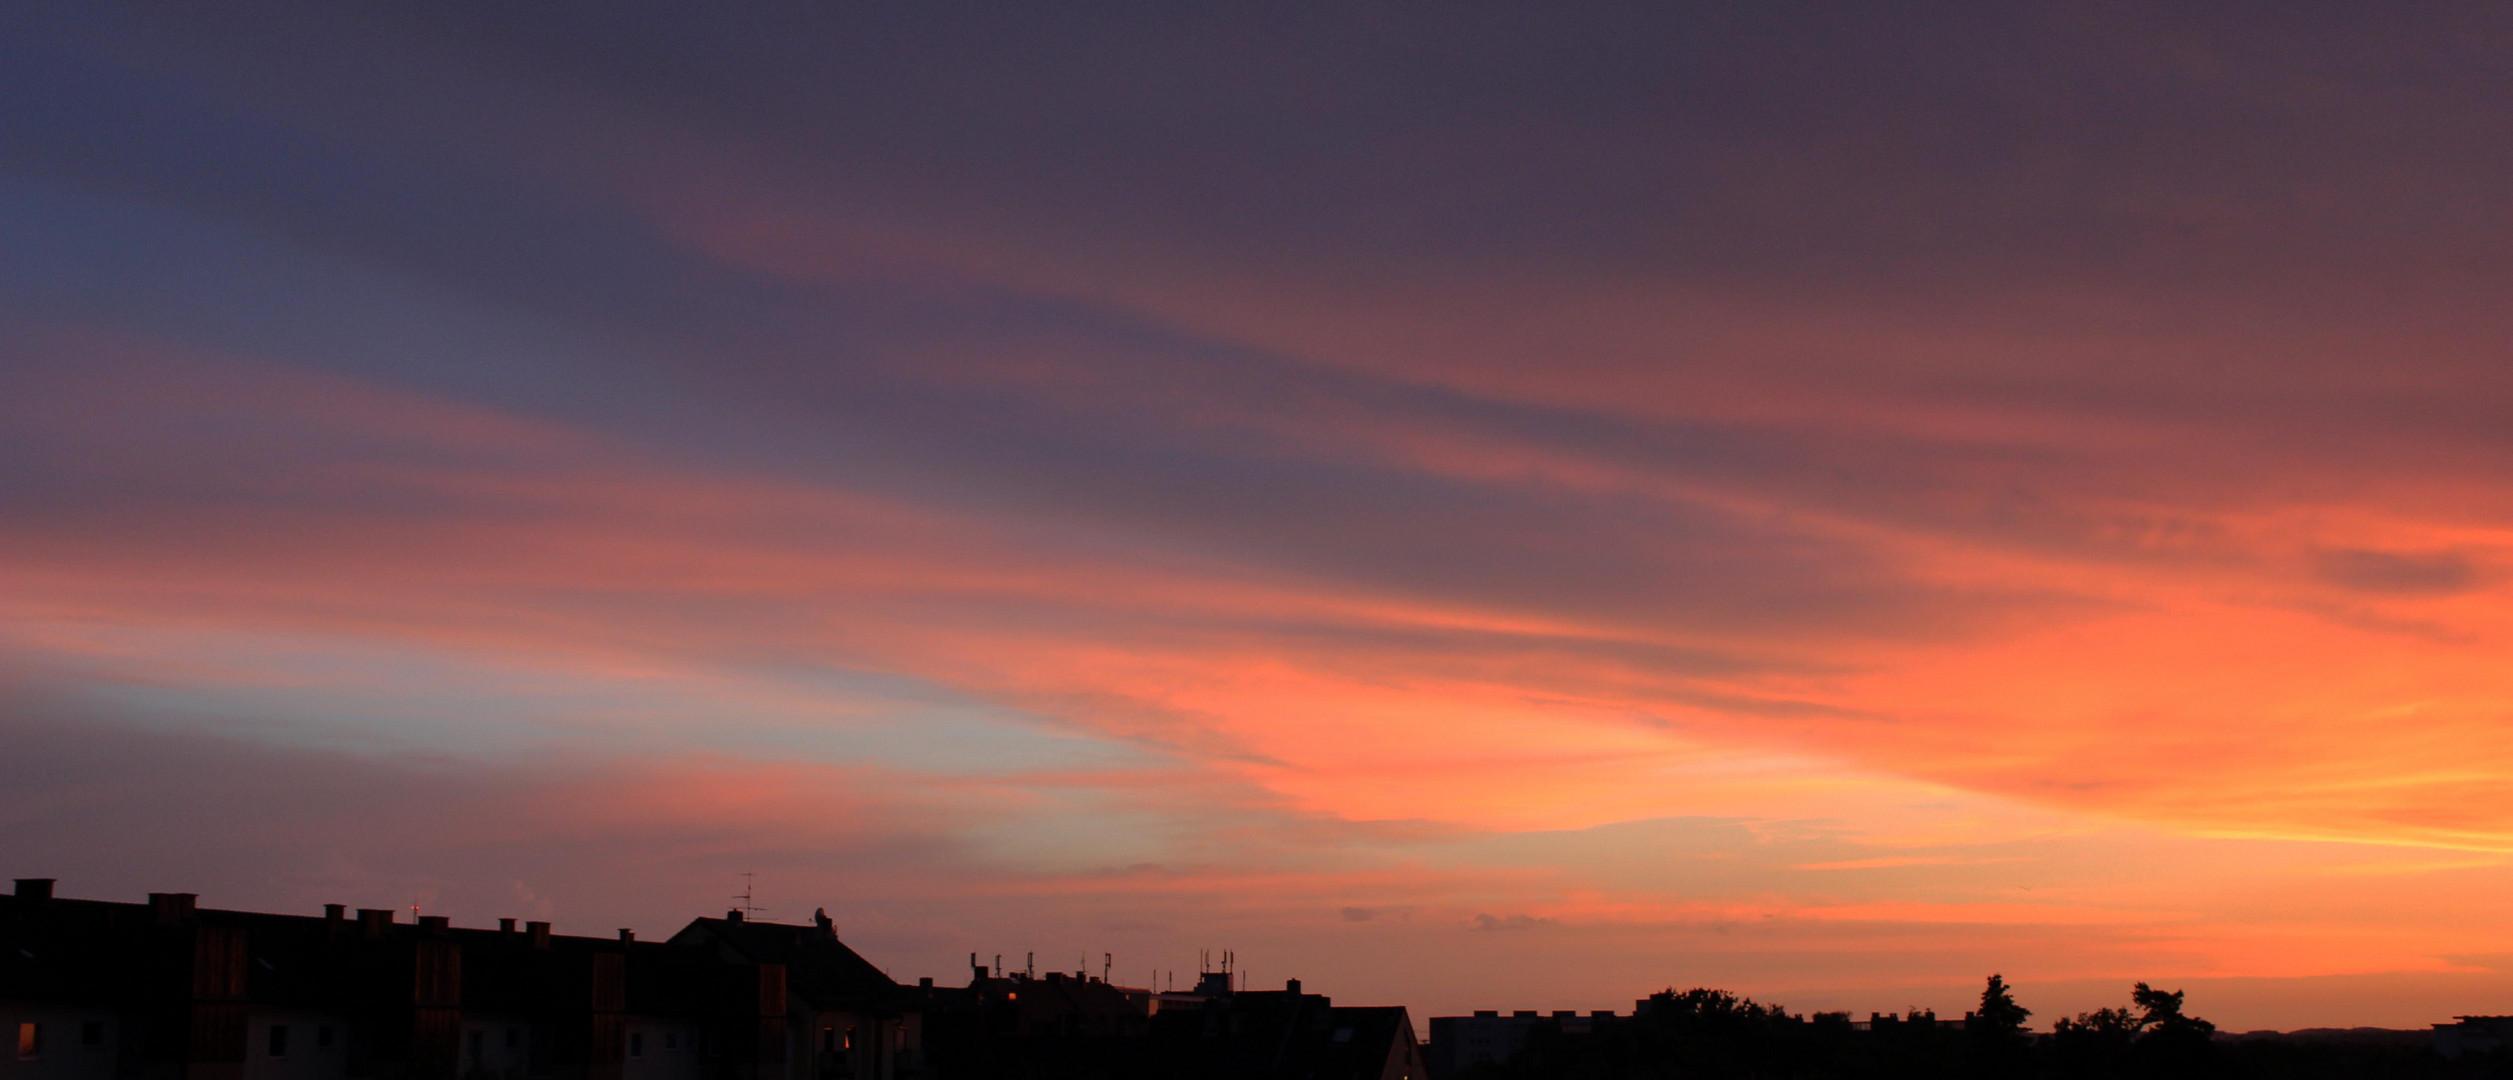 Sonnenuntergang 06.08.2013